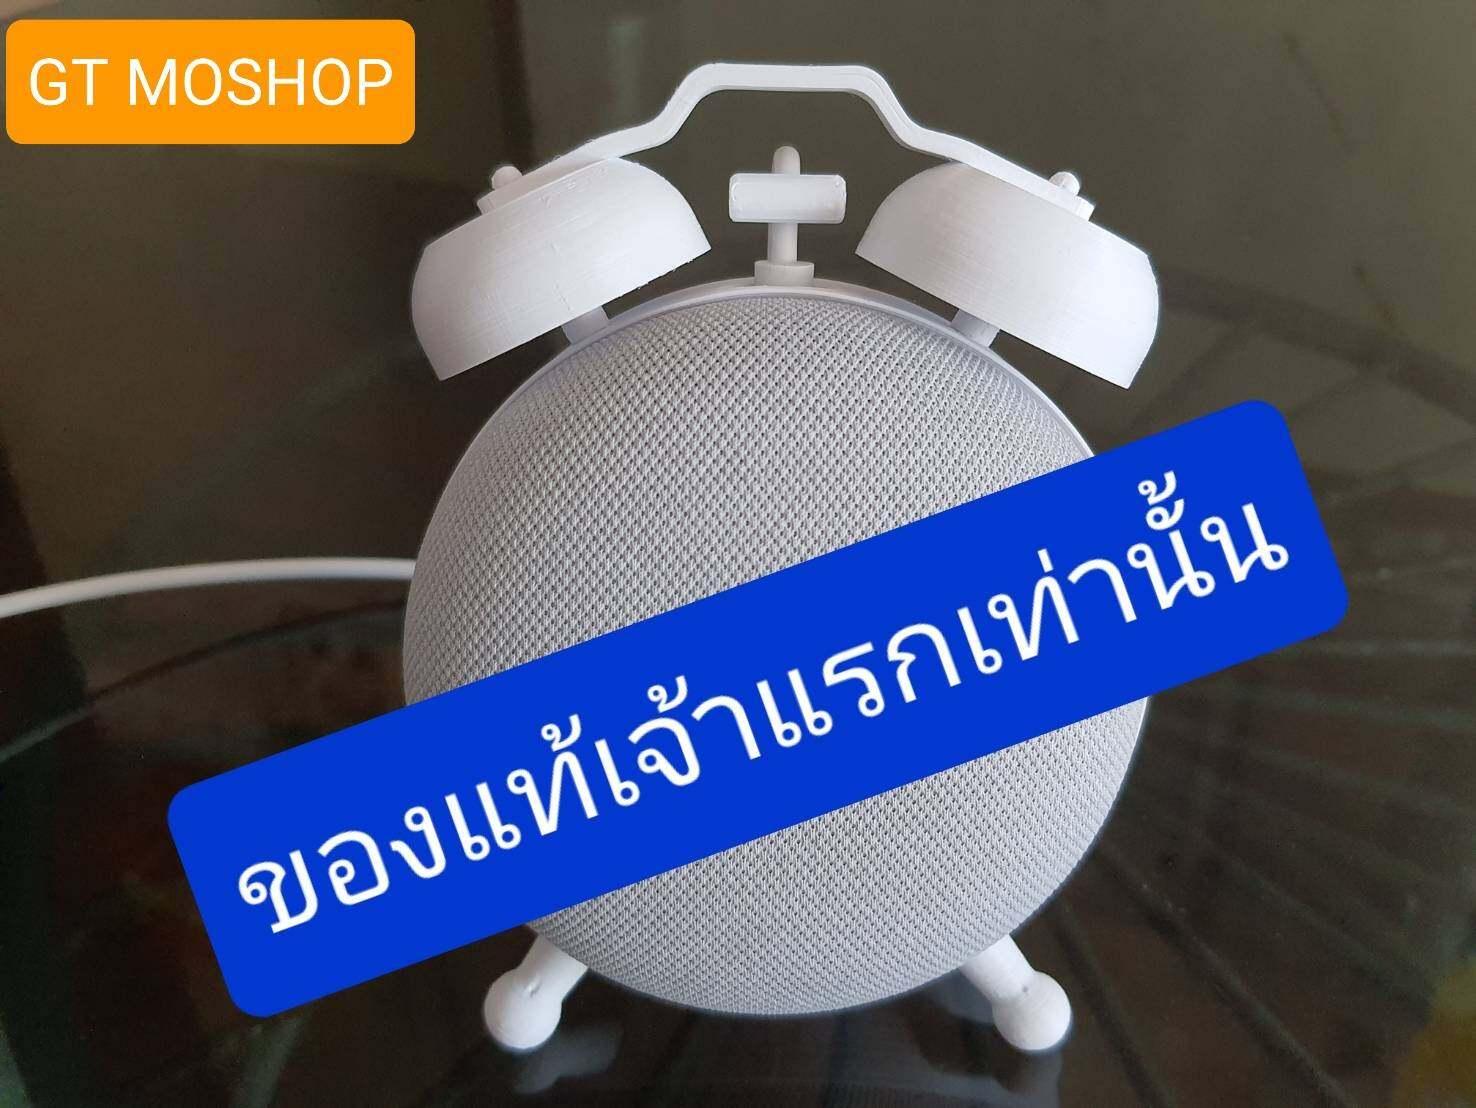 Cover Case สำหรับ Google Home Mini Stand / Google Nest Mini / Google Nest Mini 2/stand กรอบ รูปทรงนาฬิกา Google Home Mini Case Google Nest Case.